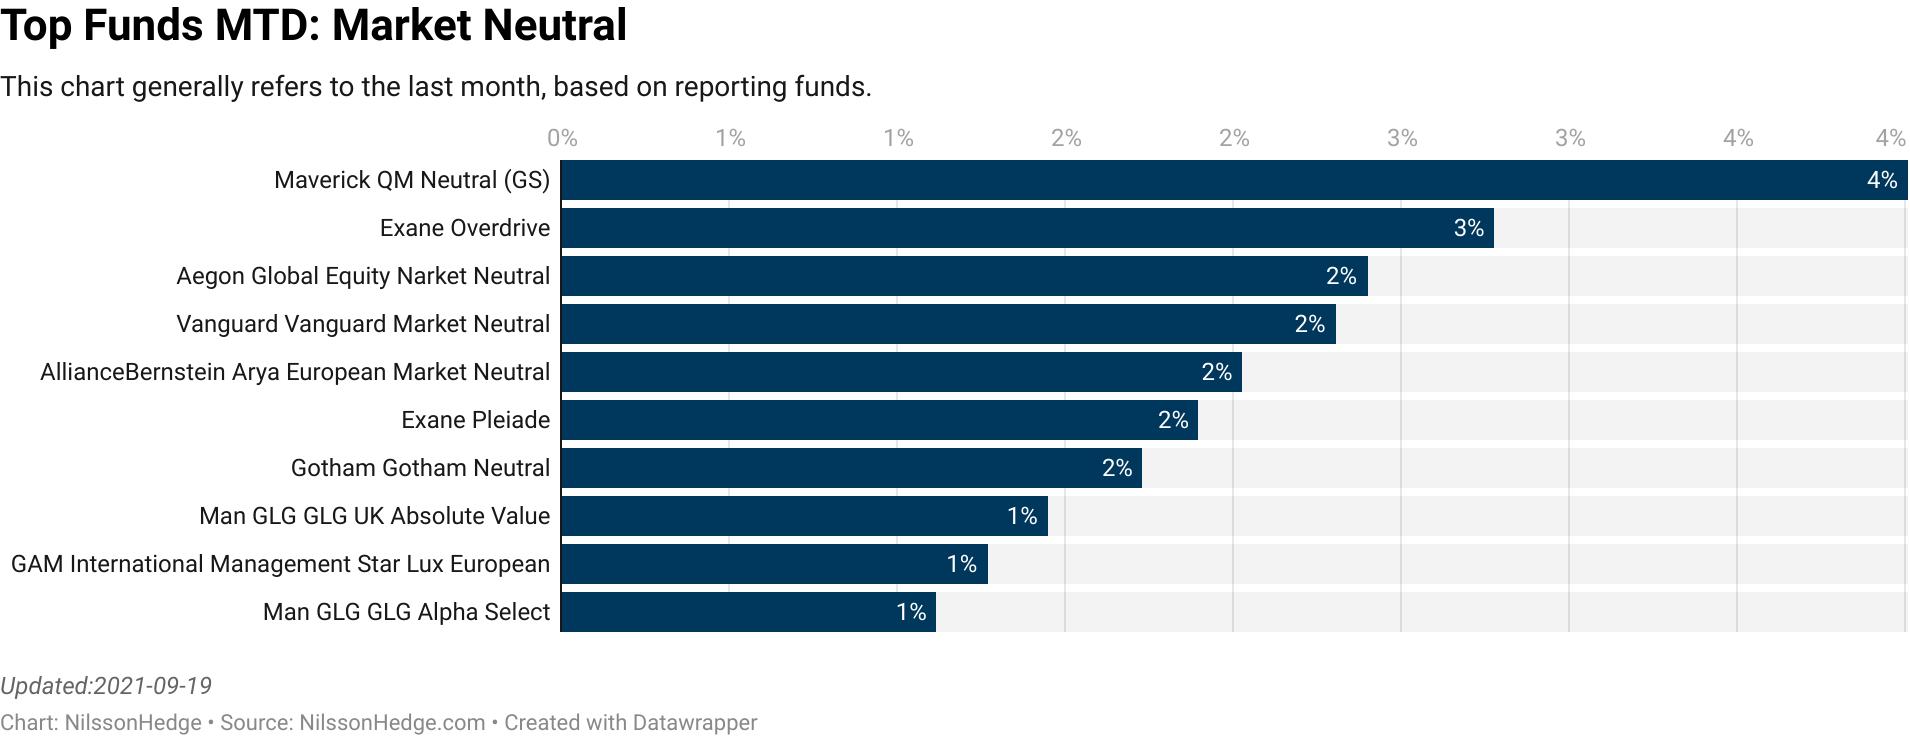 Eraam : Long Short Equity  :  4.30% [16.00]  MarshallWace : MW Tops Market Neutral  :  3.50% [715.00]  MarshallWace : MW Tops  :  3.00% [1930.00]  BlackRock : European Absolute Return  :  2.85% [1290.00]  UBP : Europe Market Neutral  :  2.33% [30.00]  RAM : Long Short European  :  2.03% [157.00]  RAM : Long Short Global  :  1.98% [19.00]  Maverick : QM Neutral (GS)  :  1.97% [363.00]  BPI : Alternative Iberian Equities  :  1.96% [285.00]  MarshallWace : MW Liquid  :  1.69% [1244.00]